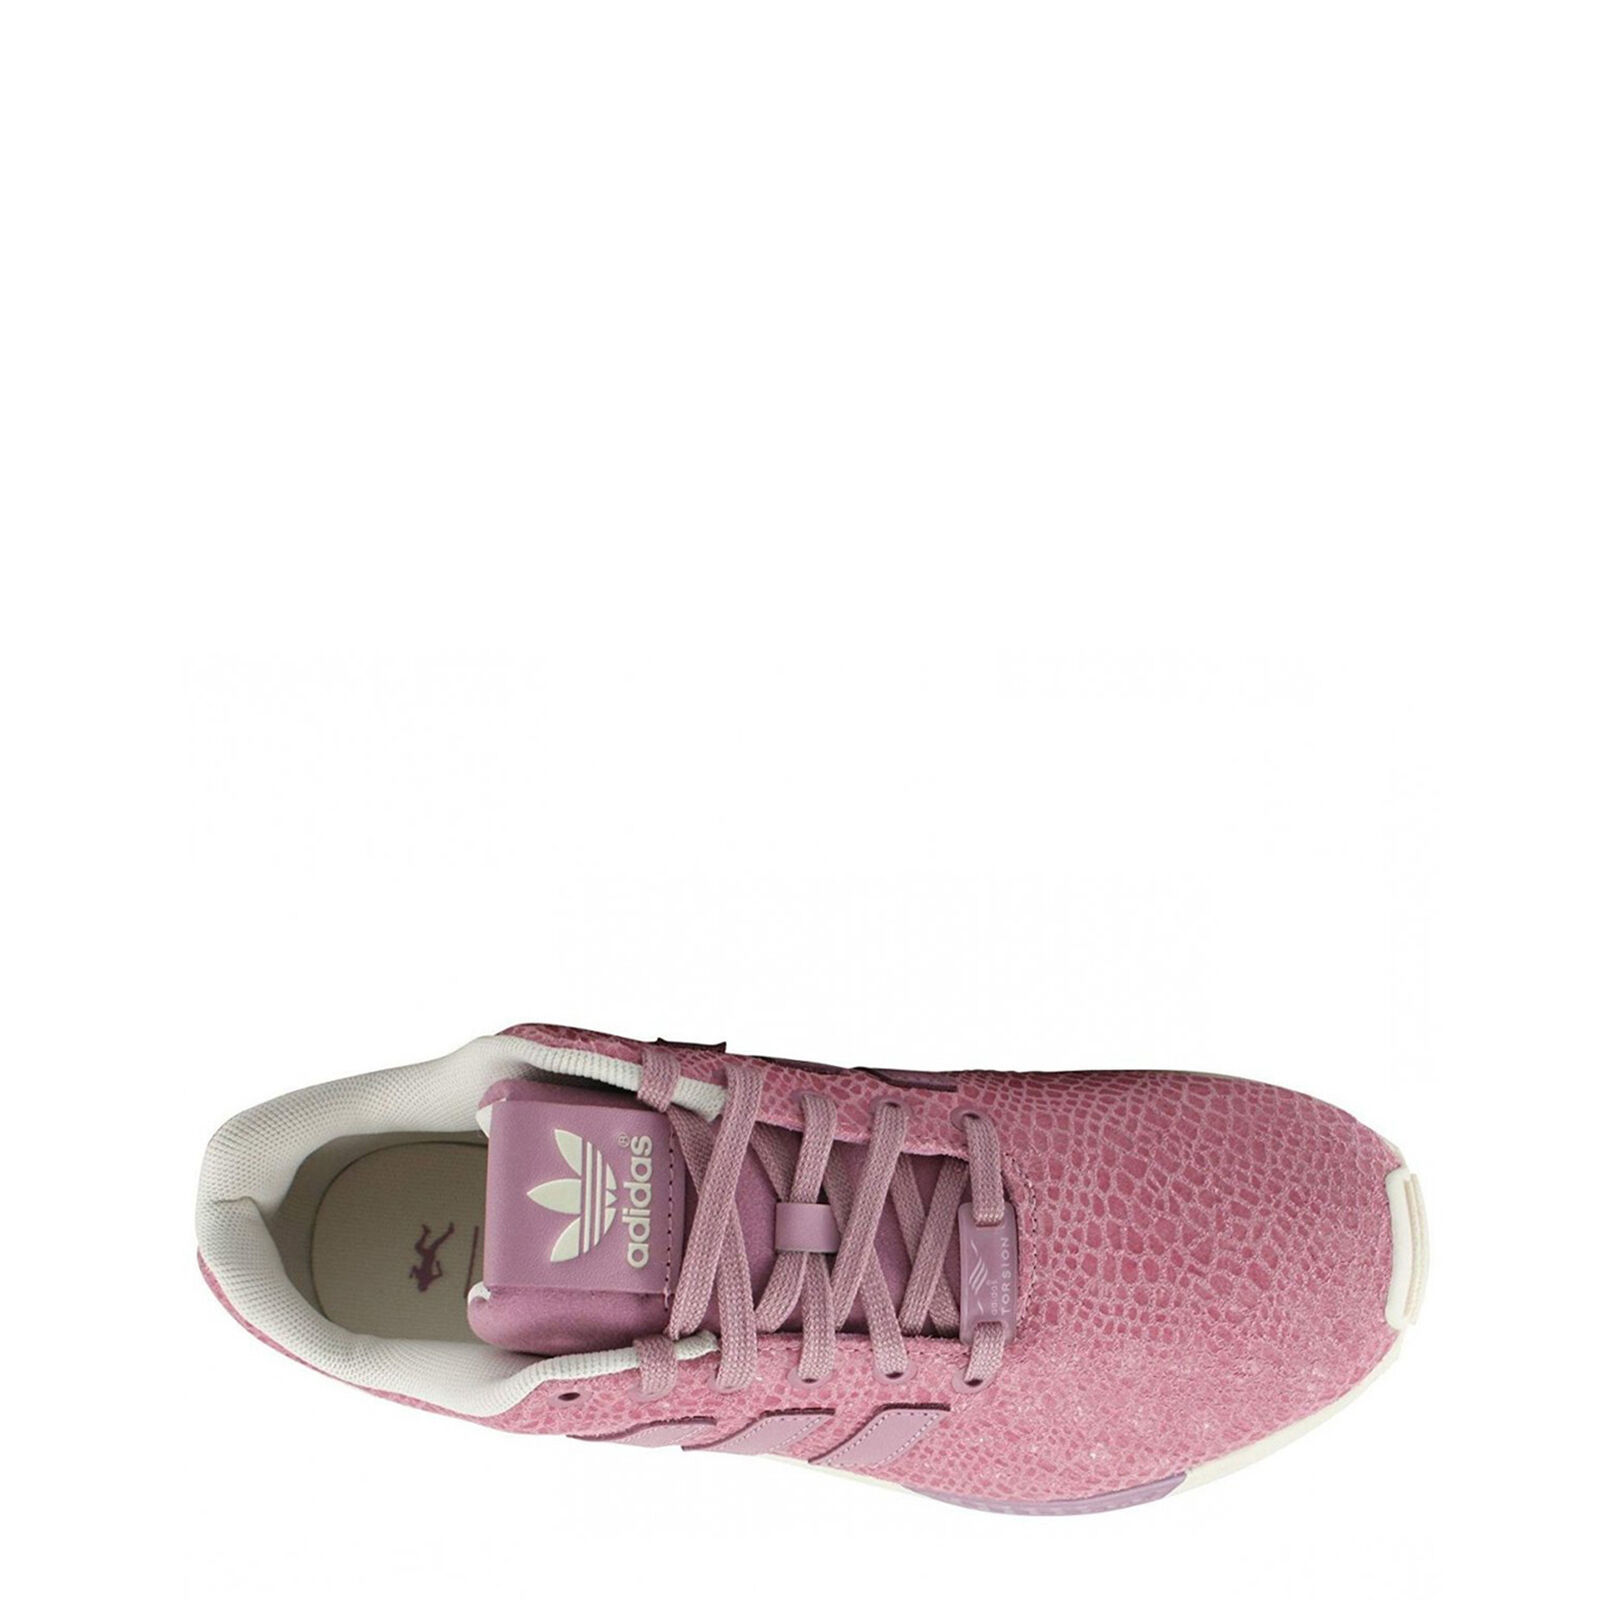 Scarpe Adidas Donna ZX FLUX, Sneakers Rosa B35311 effetto mosaico